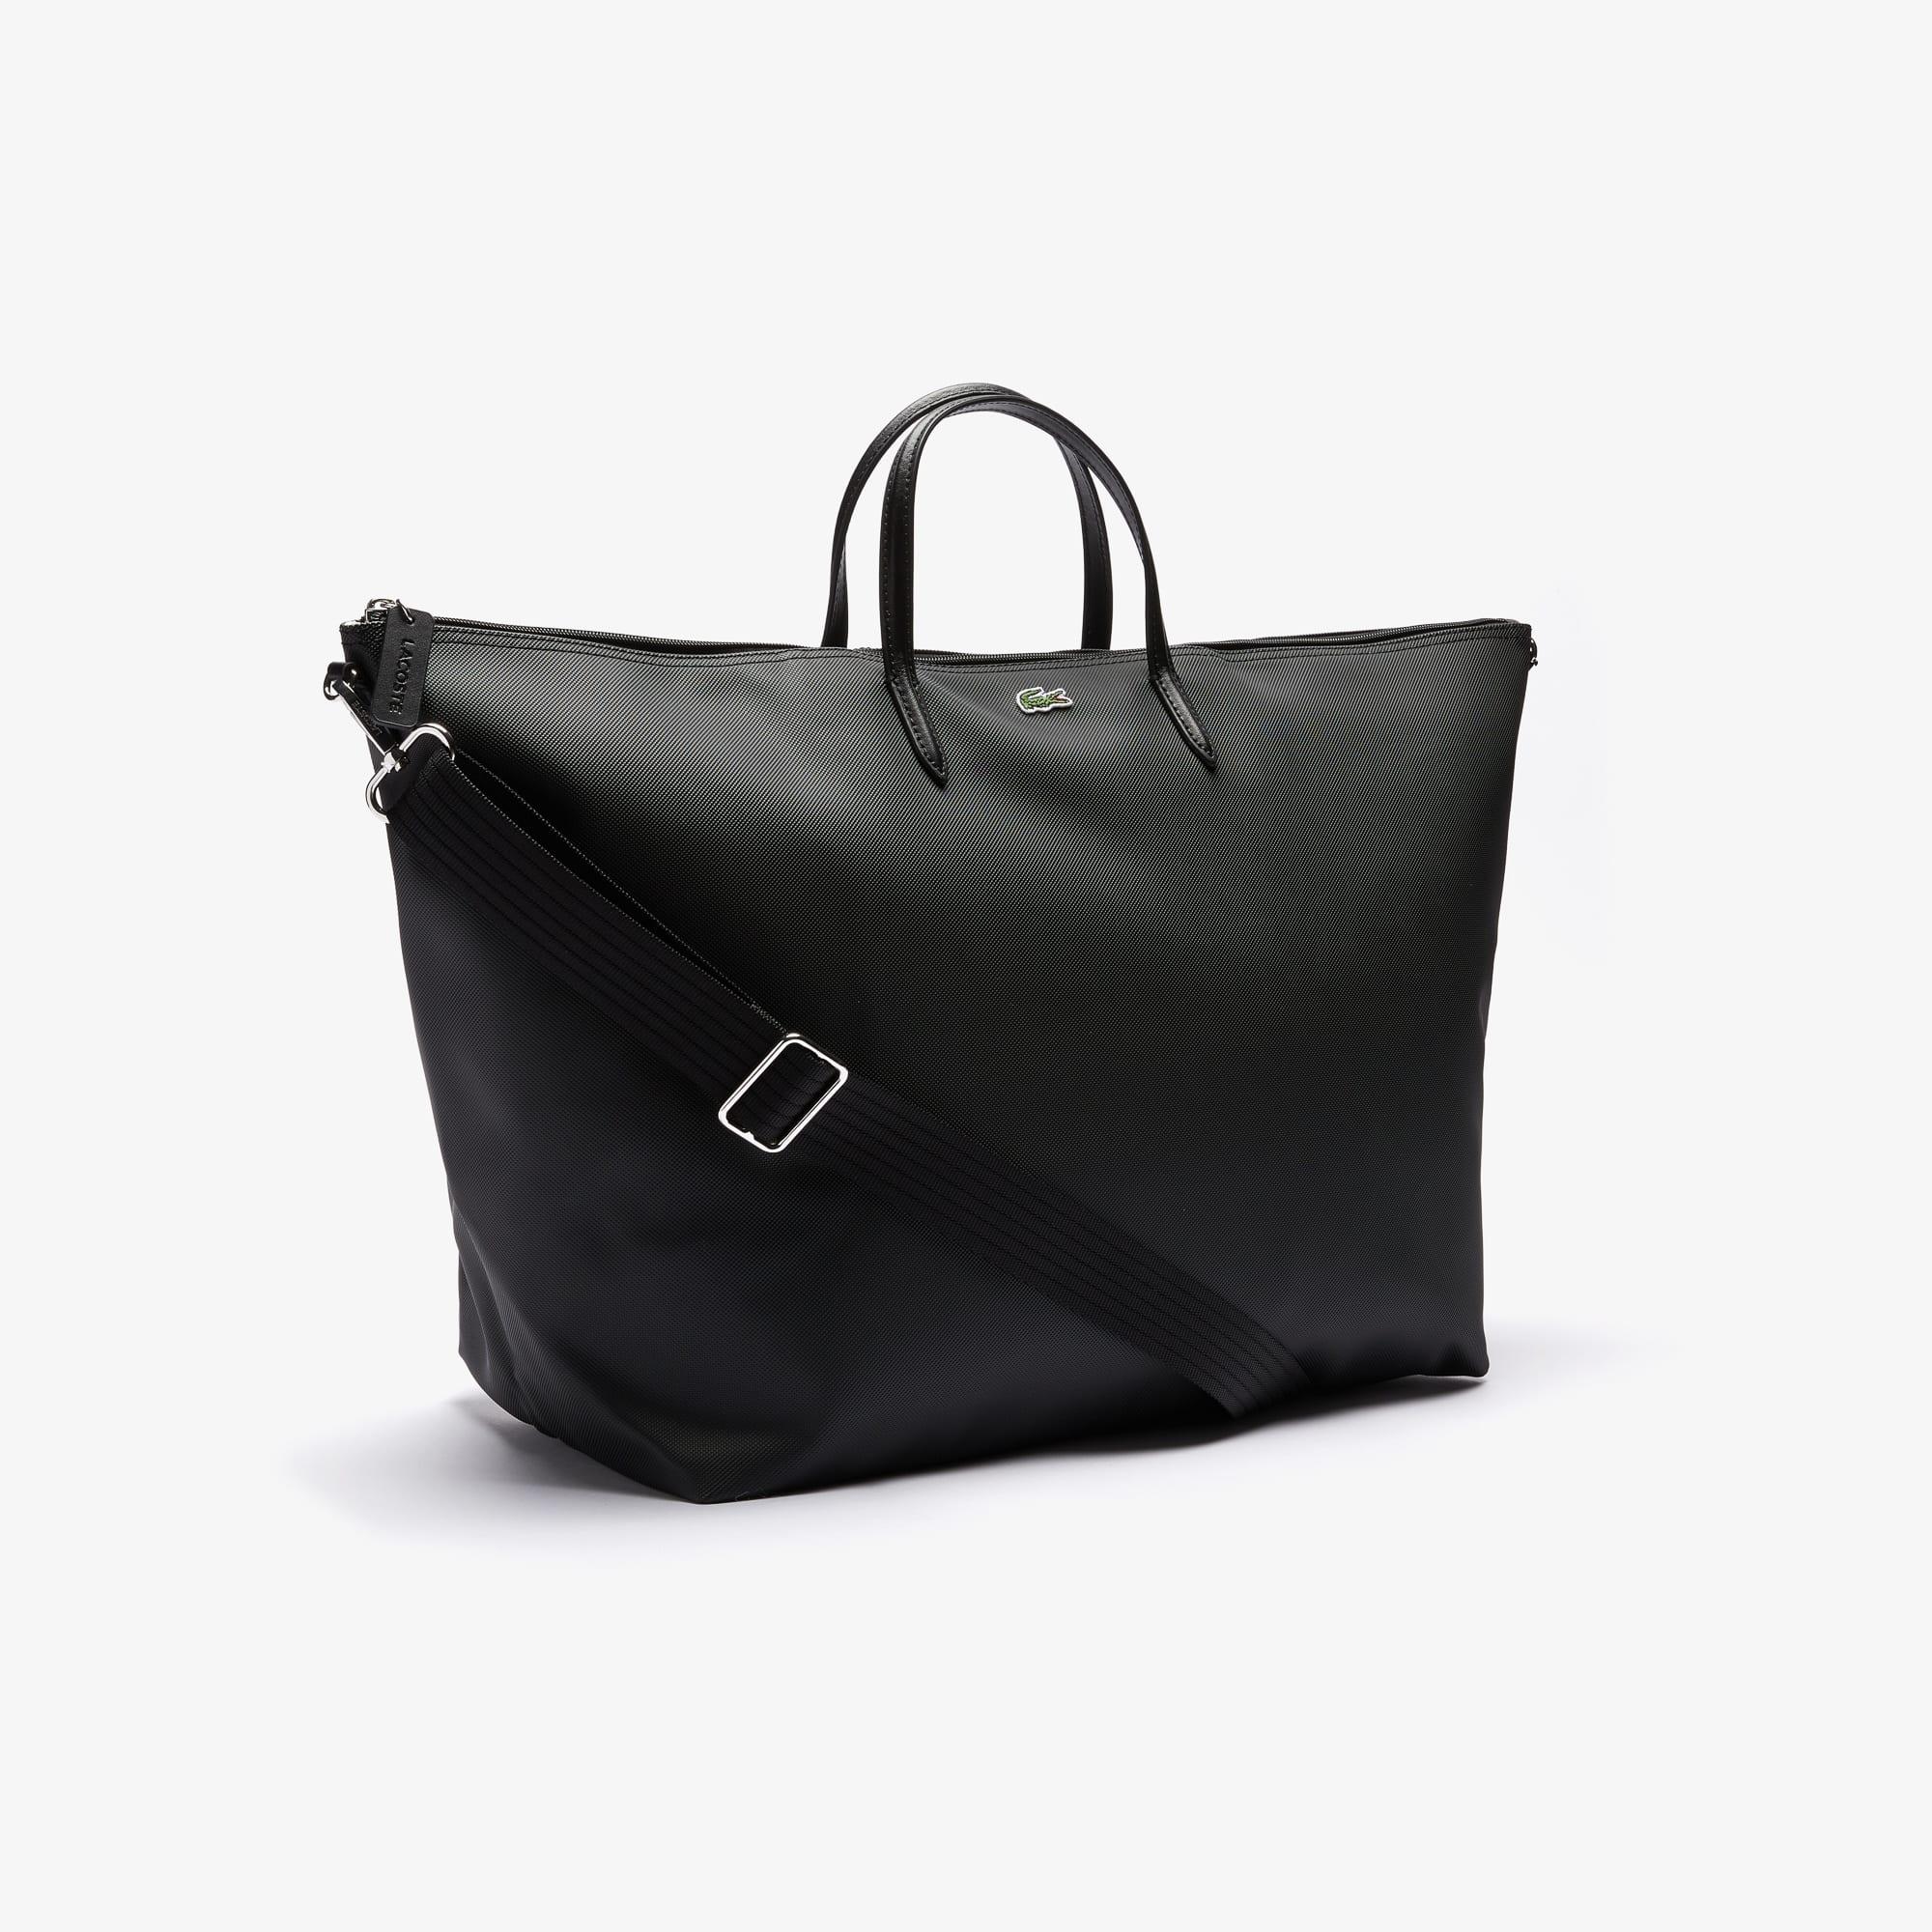 e6221c37 Women's L.12.12 Weekend Tote Bag | LACOSTE